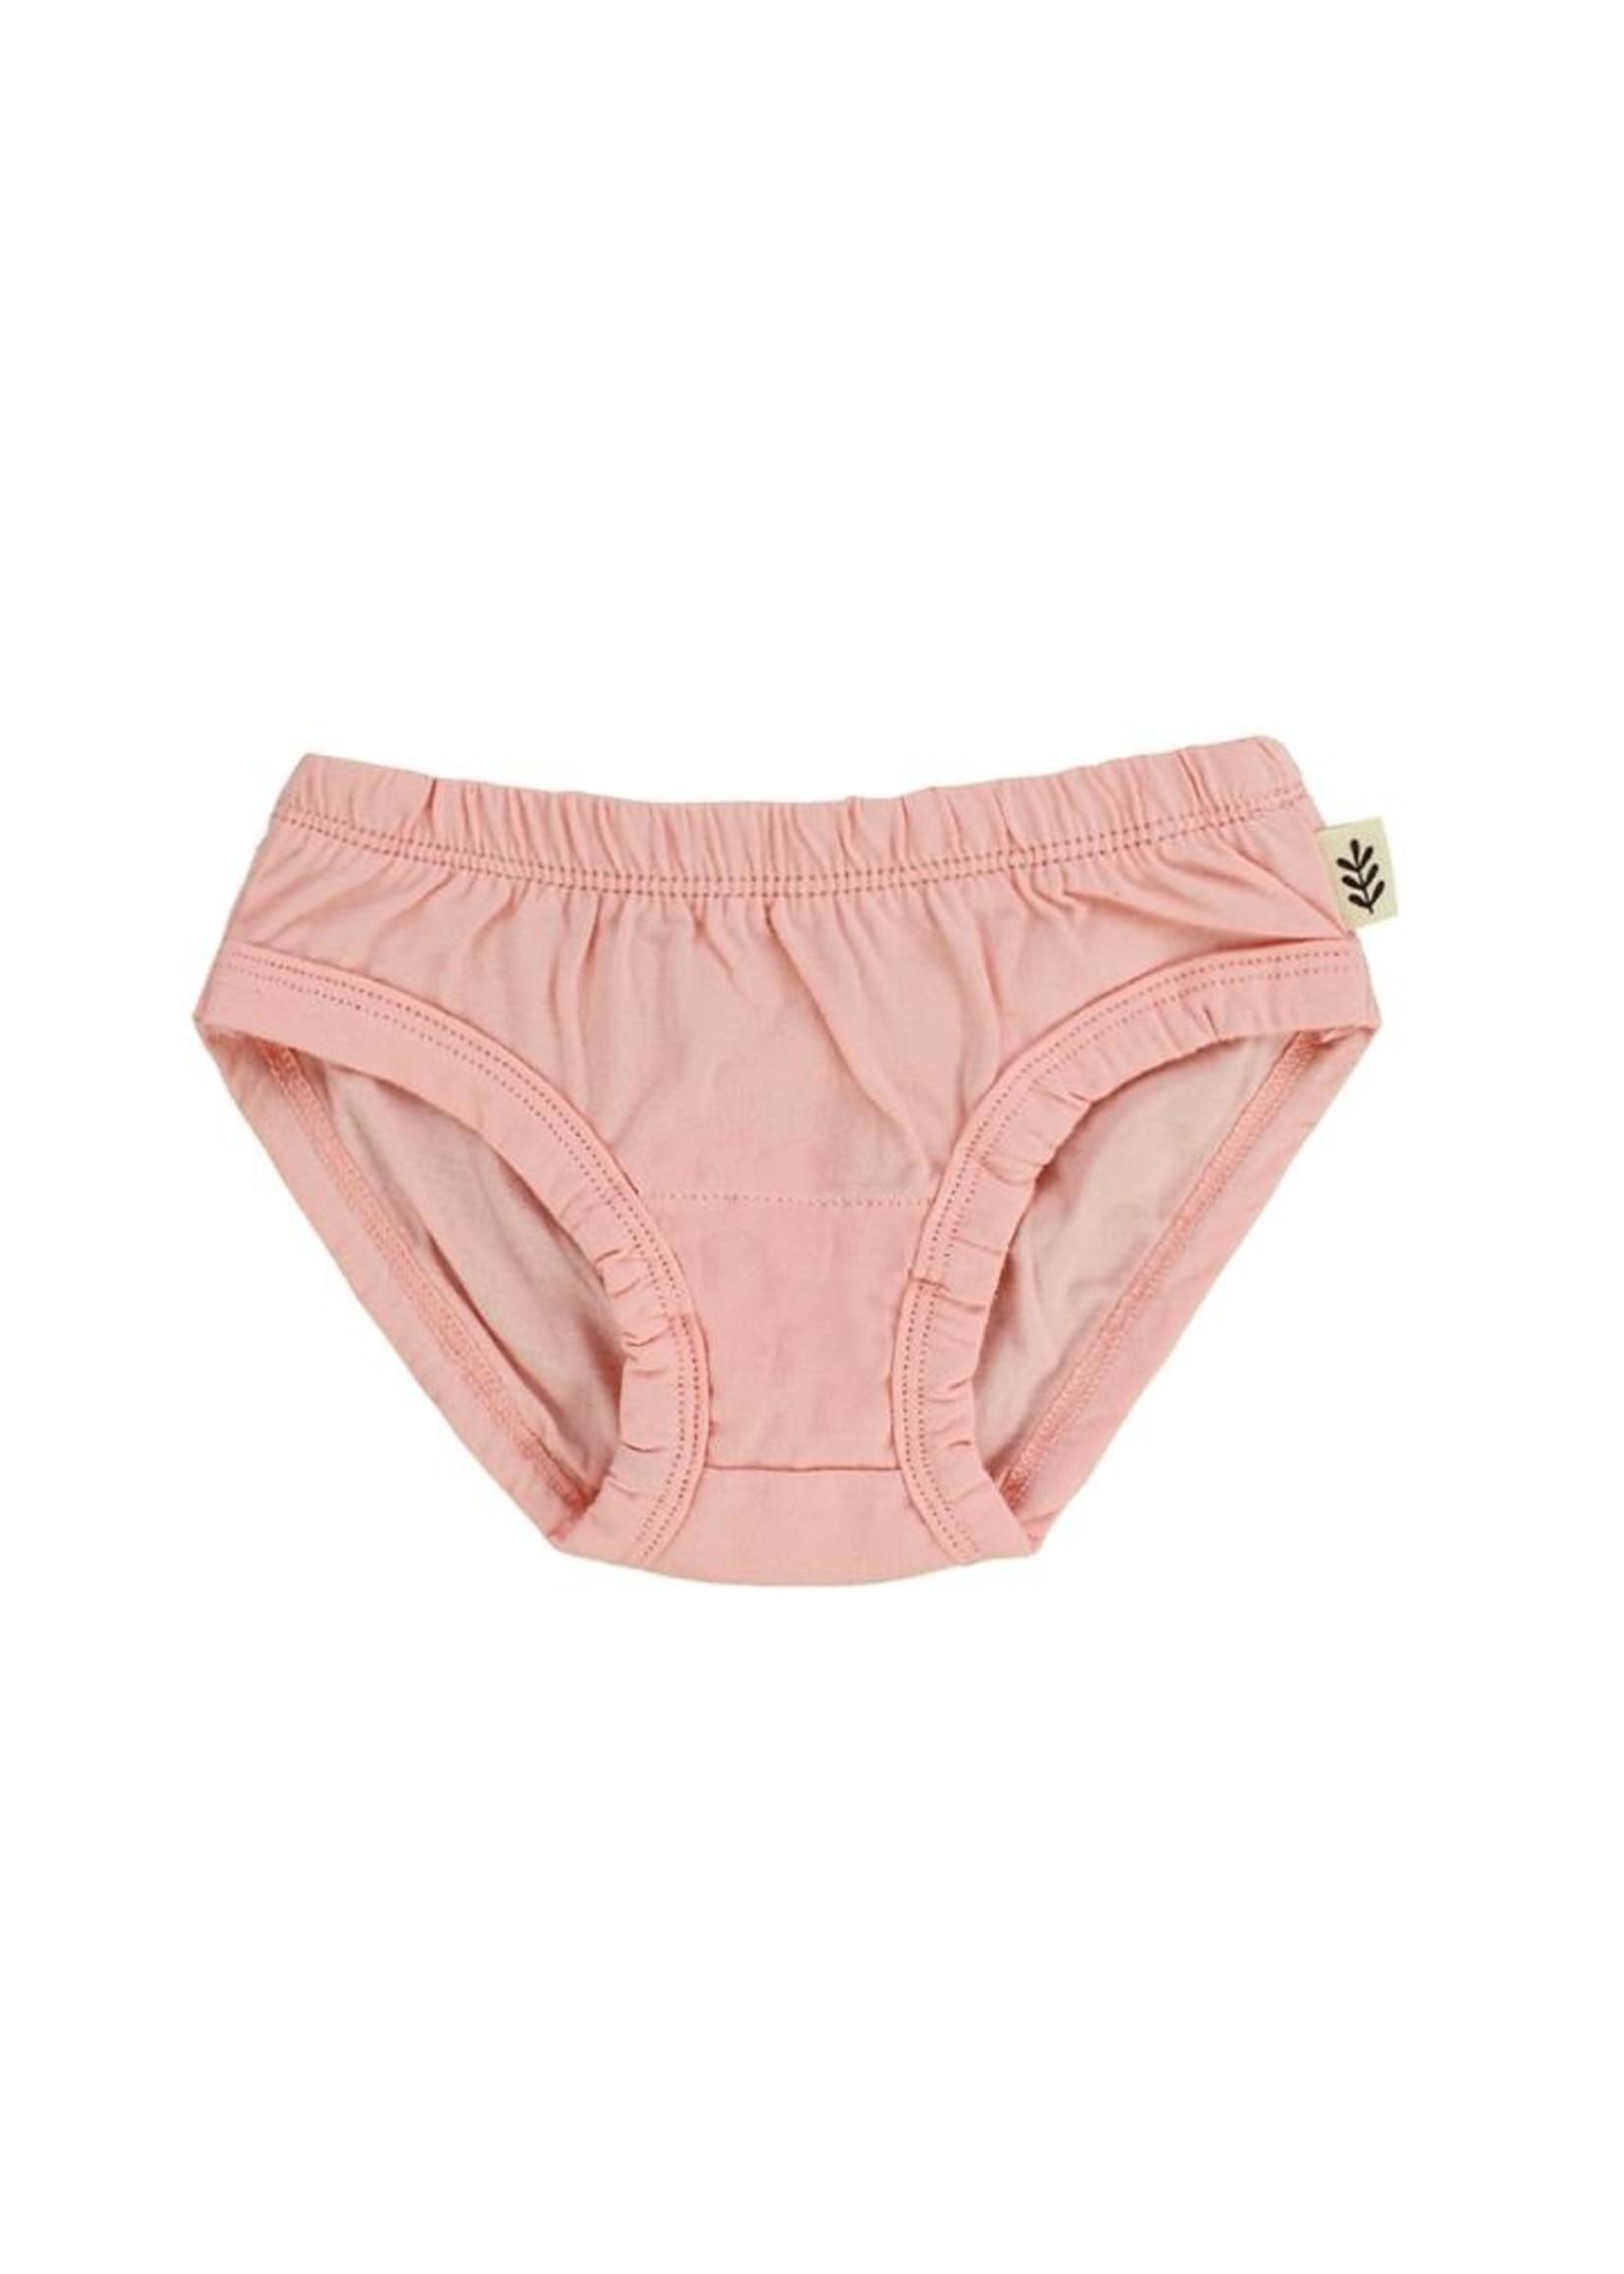 Les petites natures Petites culottes